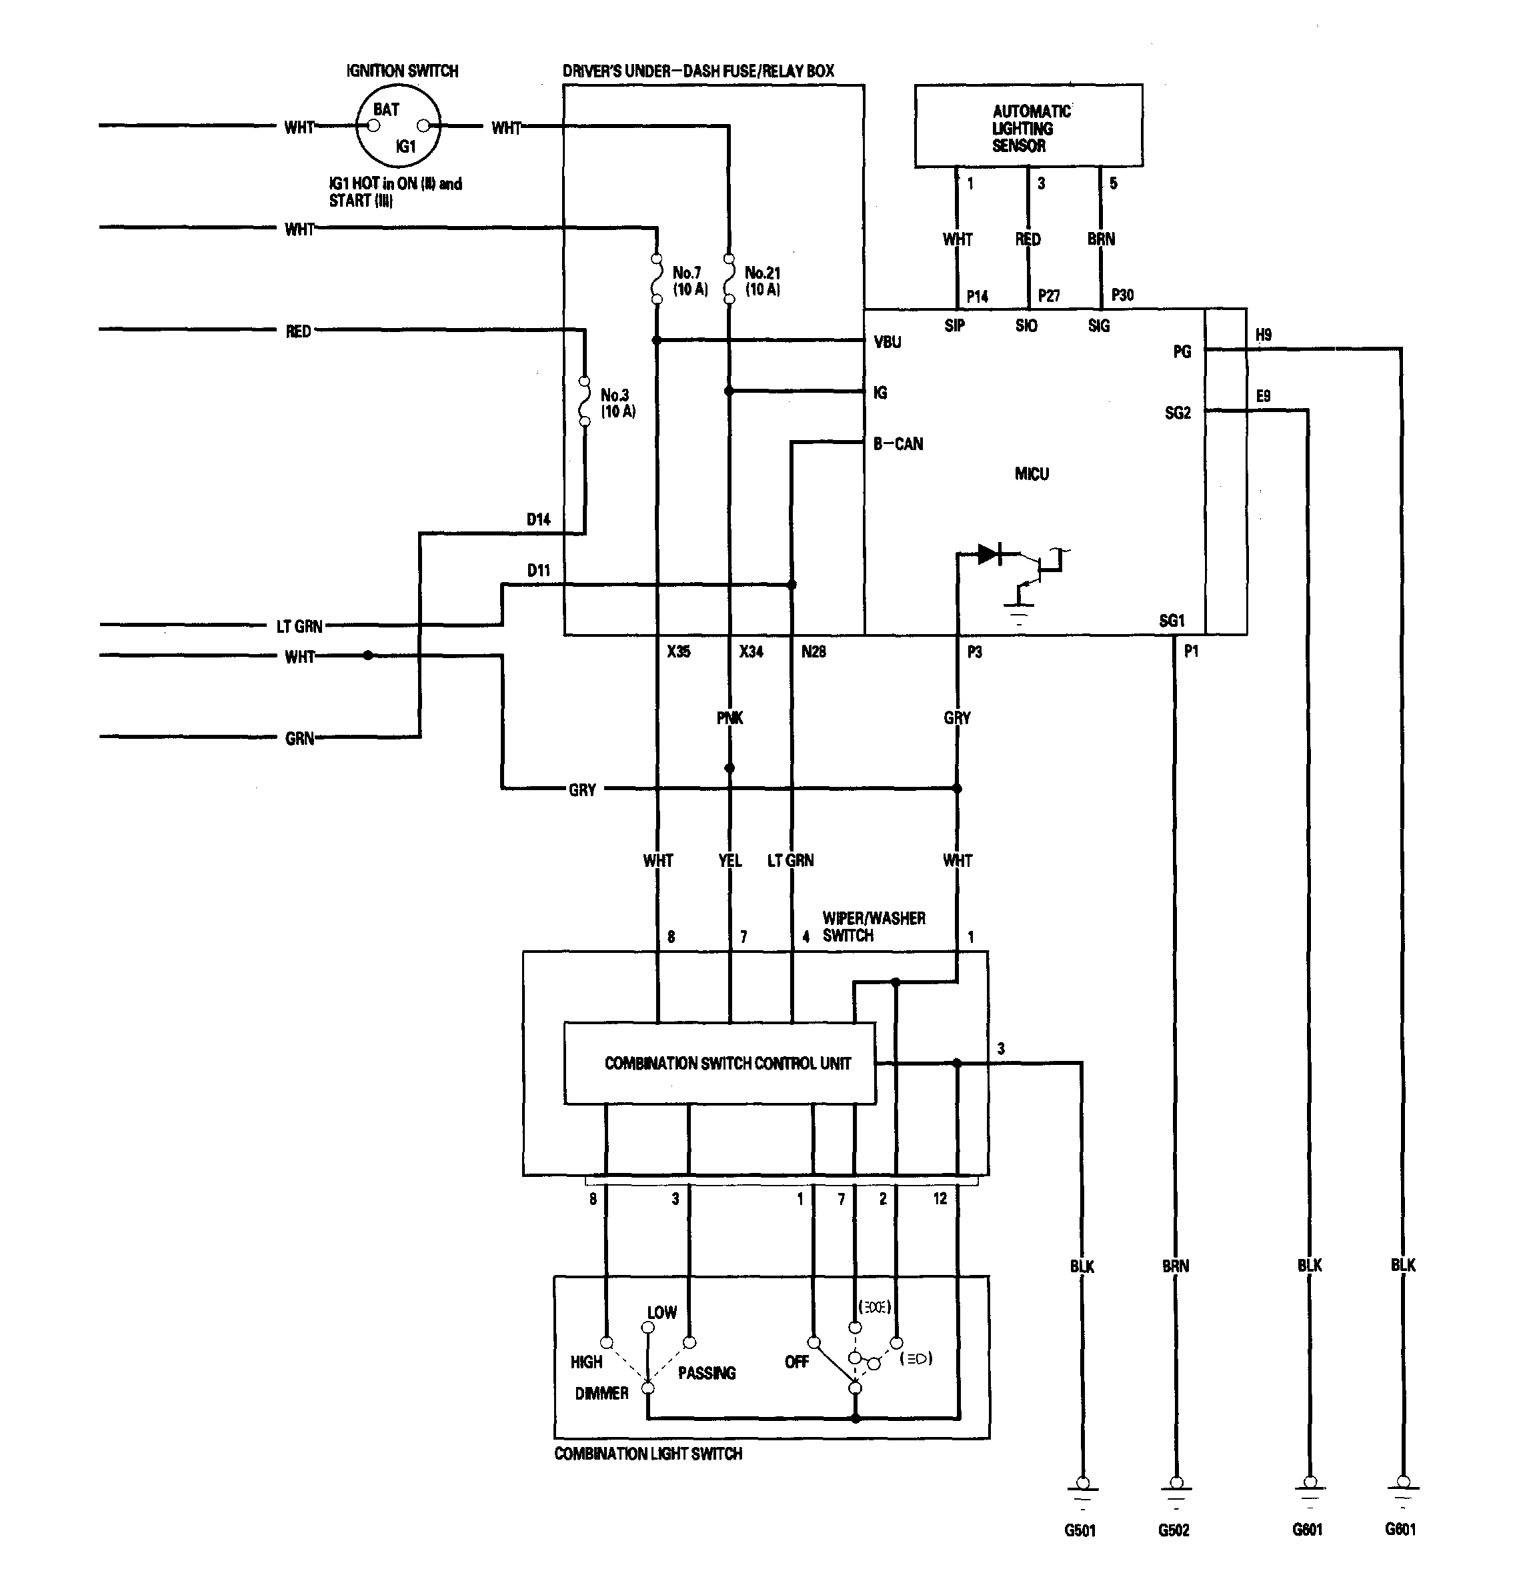 Wiring Diagrams Lighting For Bat. Wiring Diagram Air